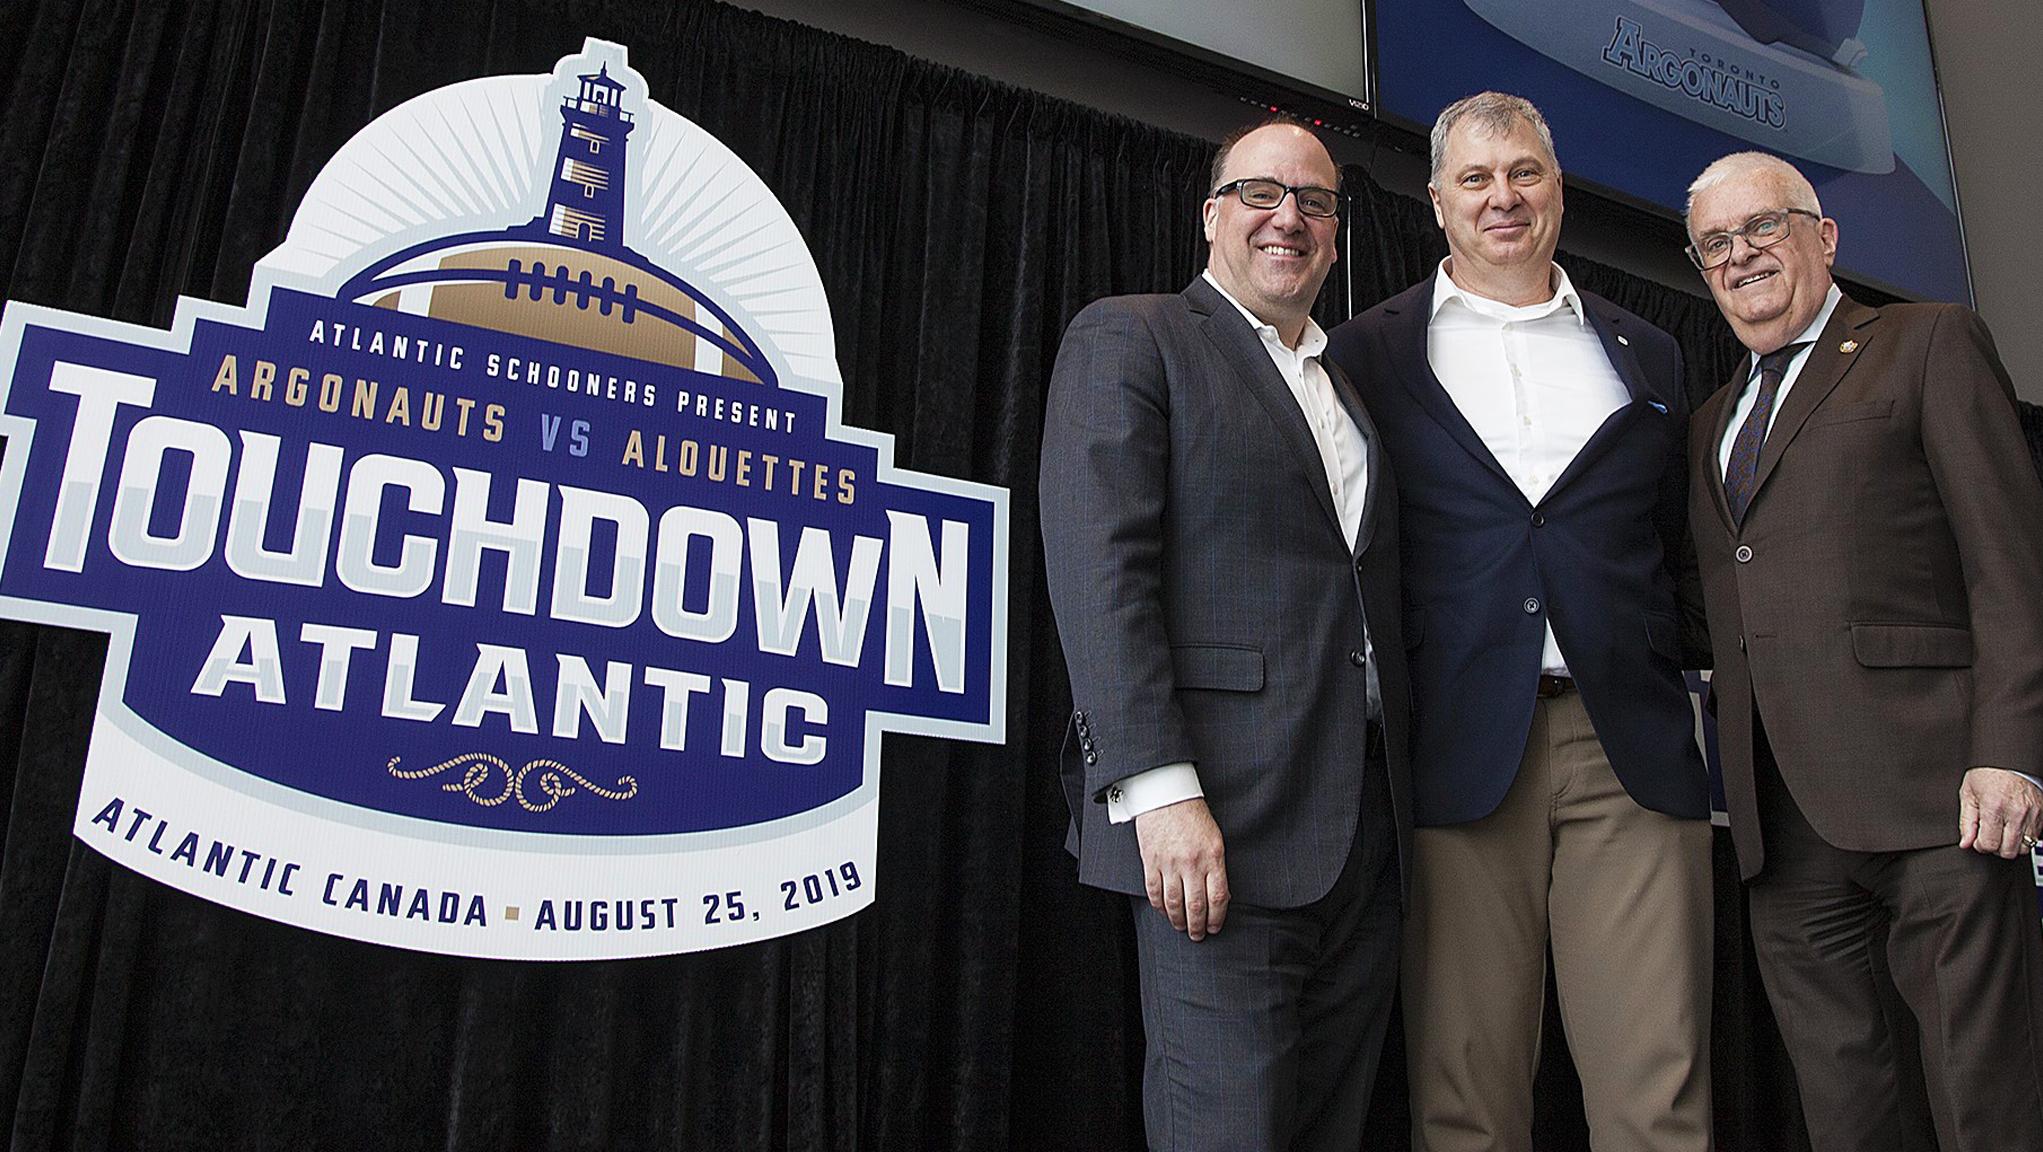 LeBlanc: TD Atlantic bringing added hype to Maritime expansion effort - CFL.ca